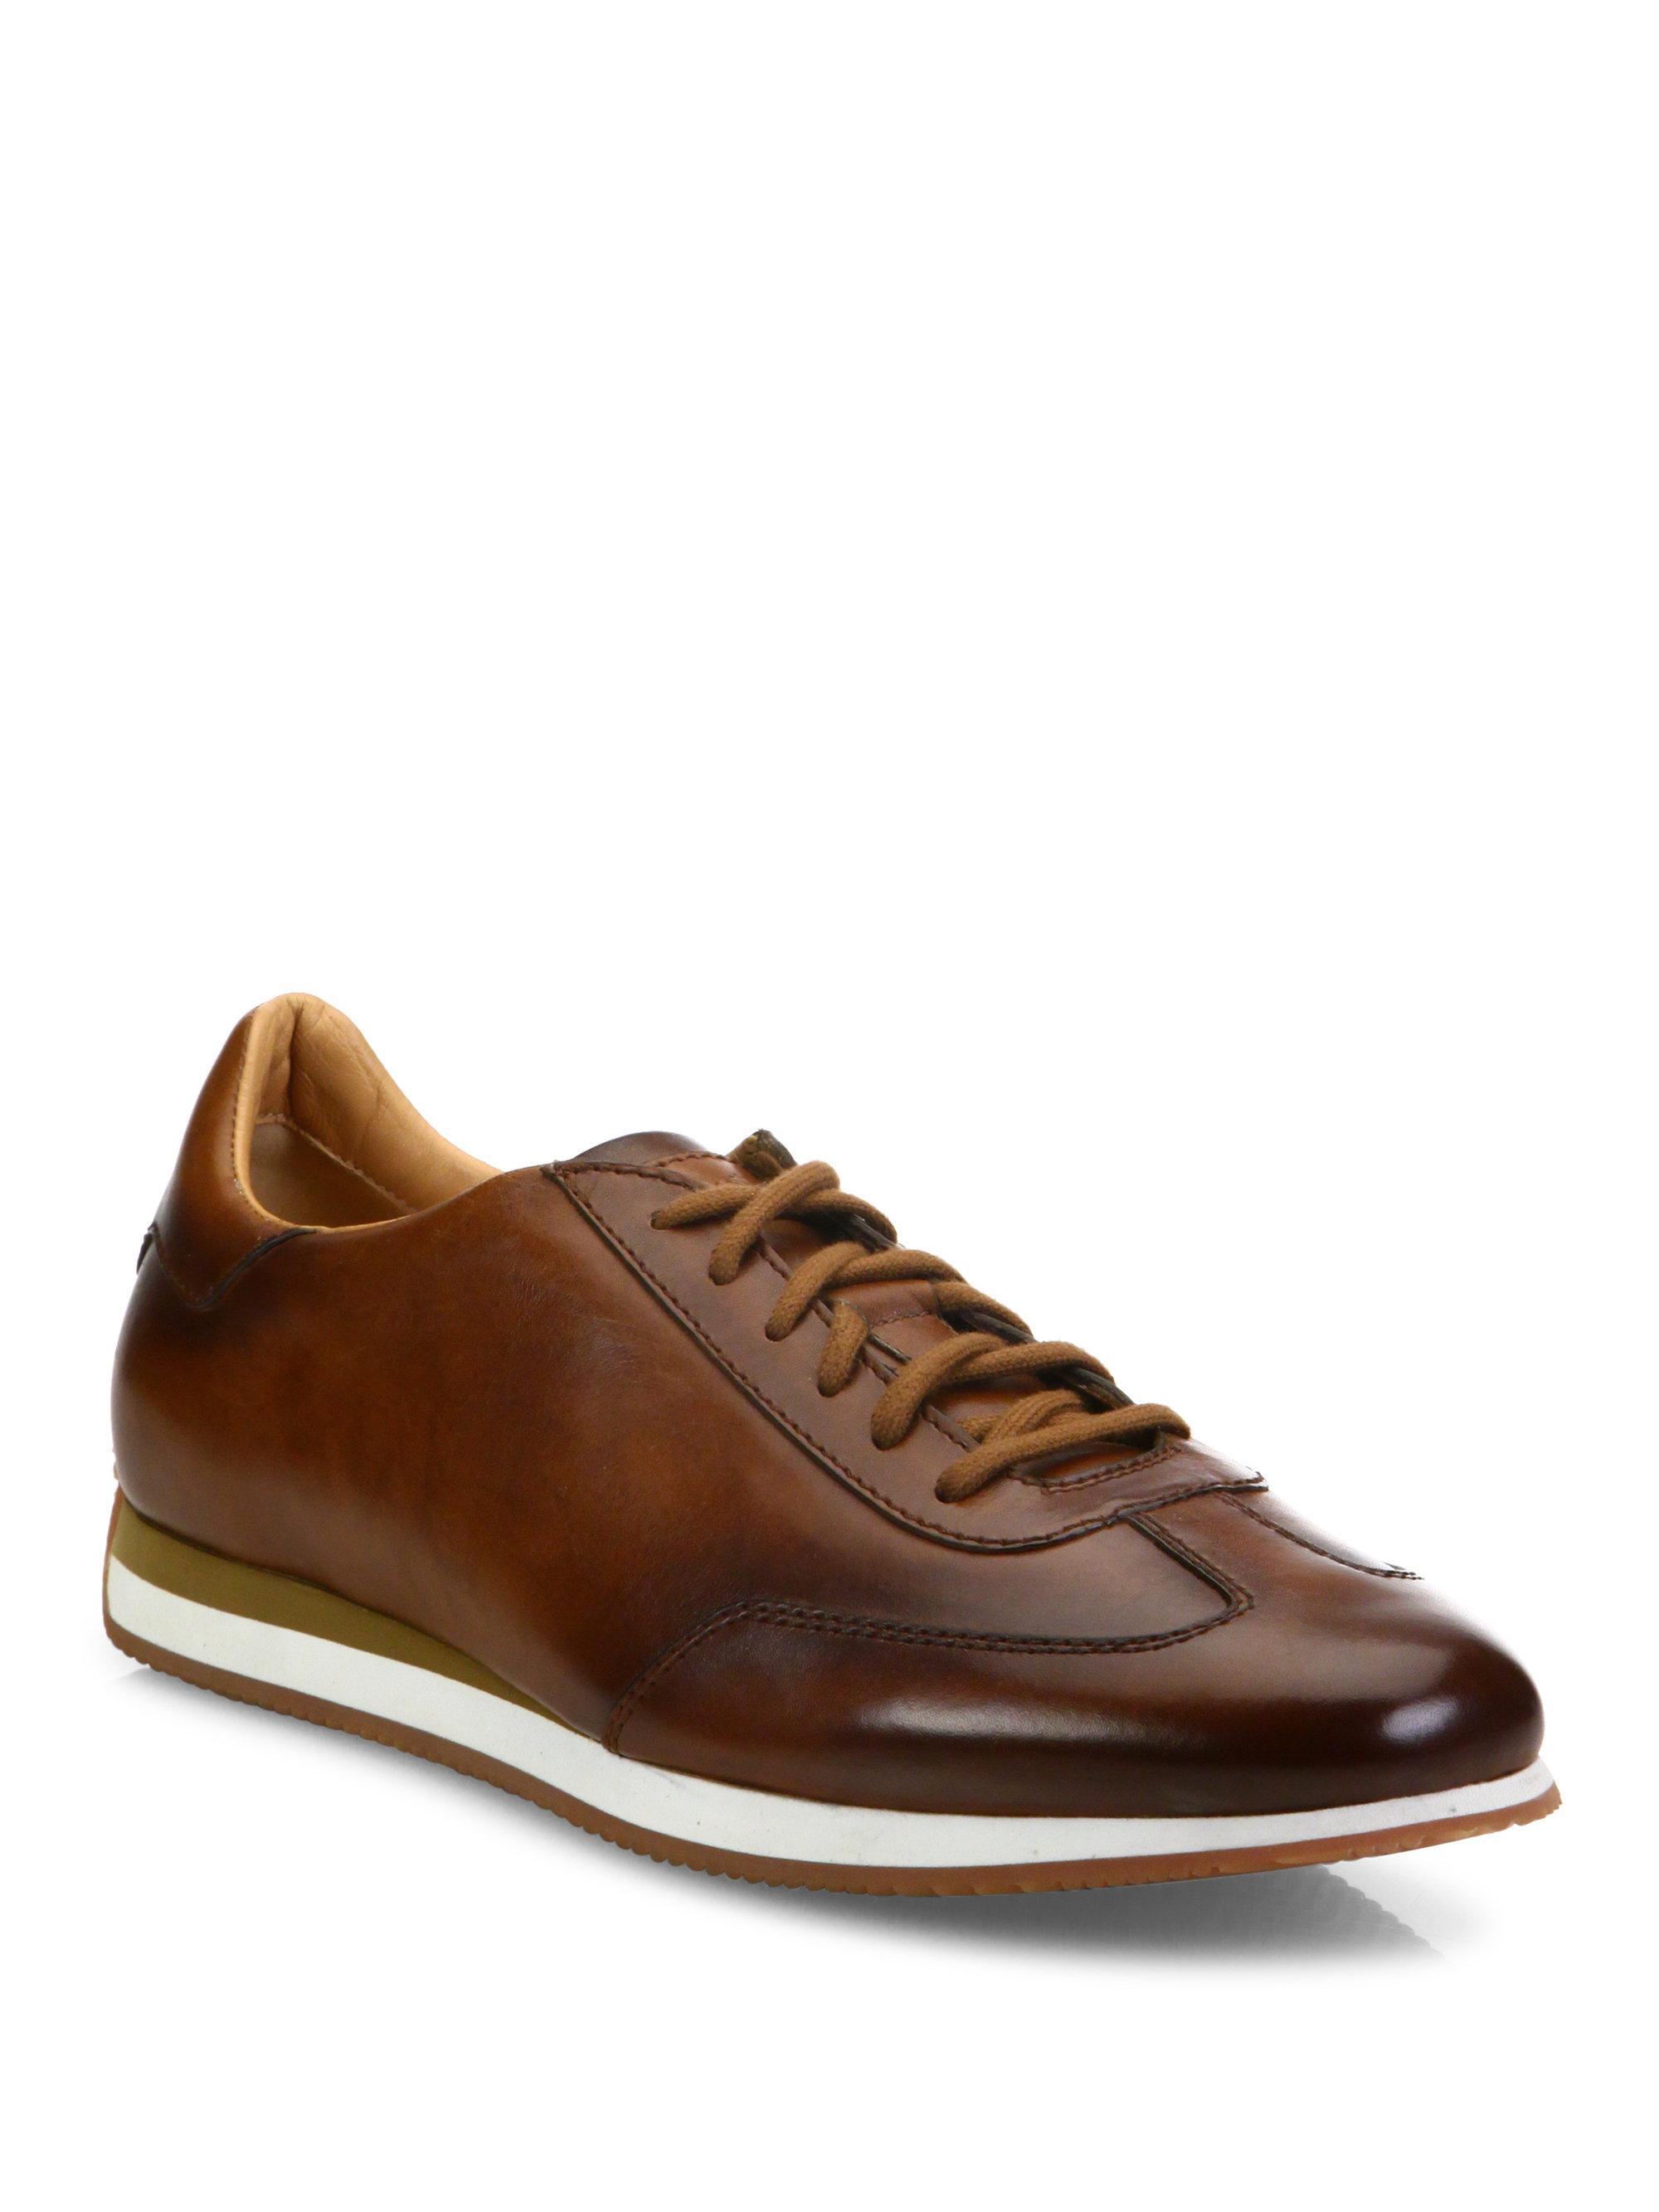 santoniLow-Top Leather Sneakers